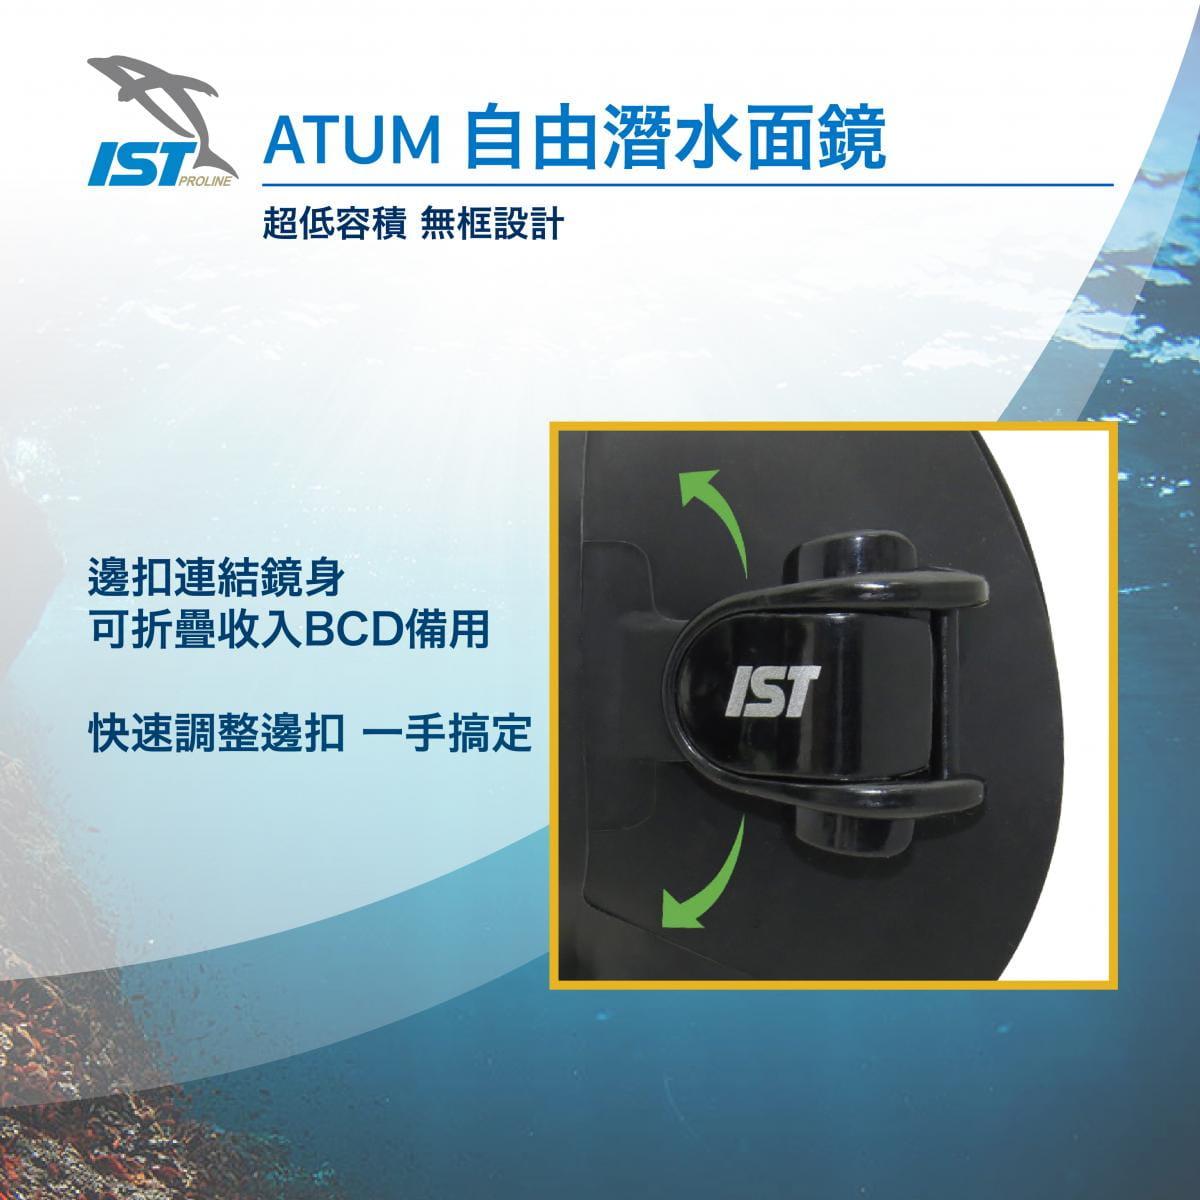 【IST】MIT ATUM 自由潛水面鏡 超低容積 無框設計 MP208 3